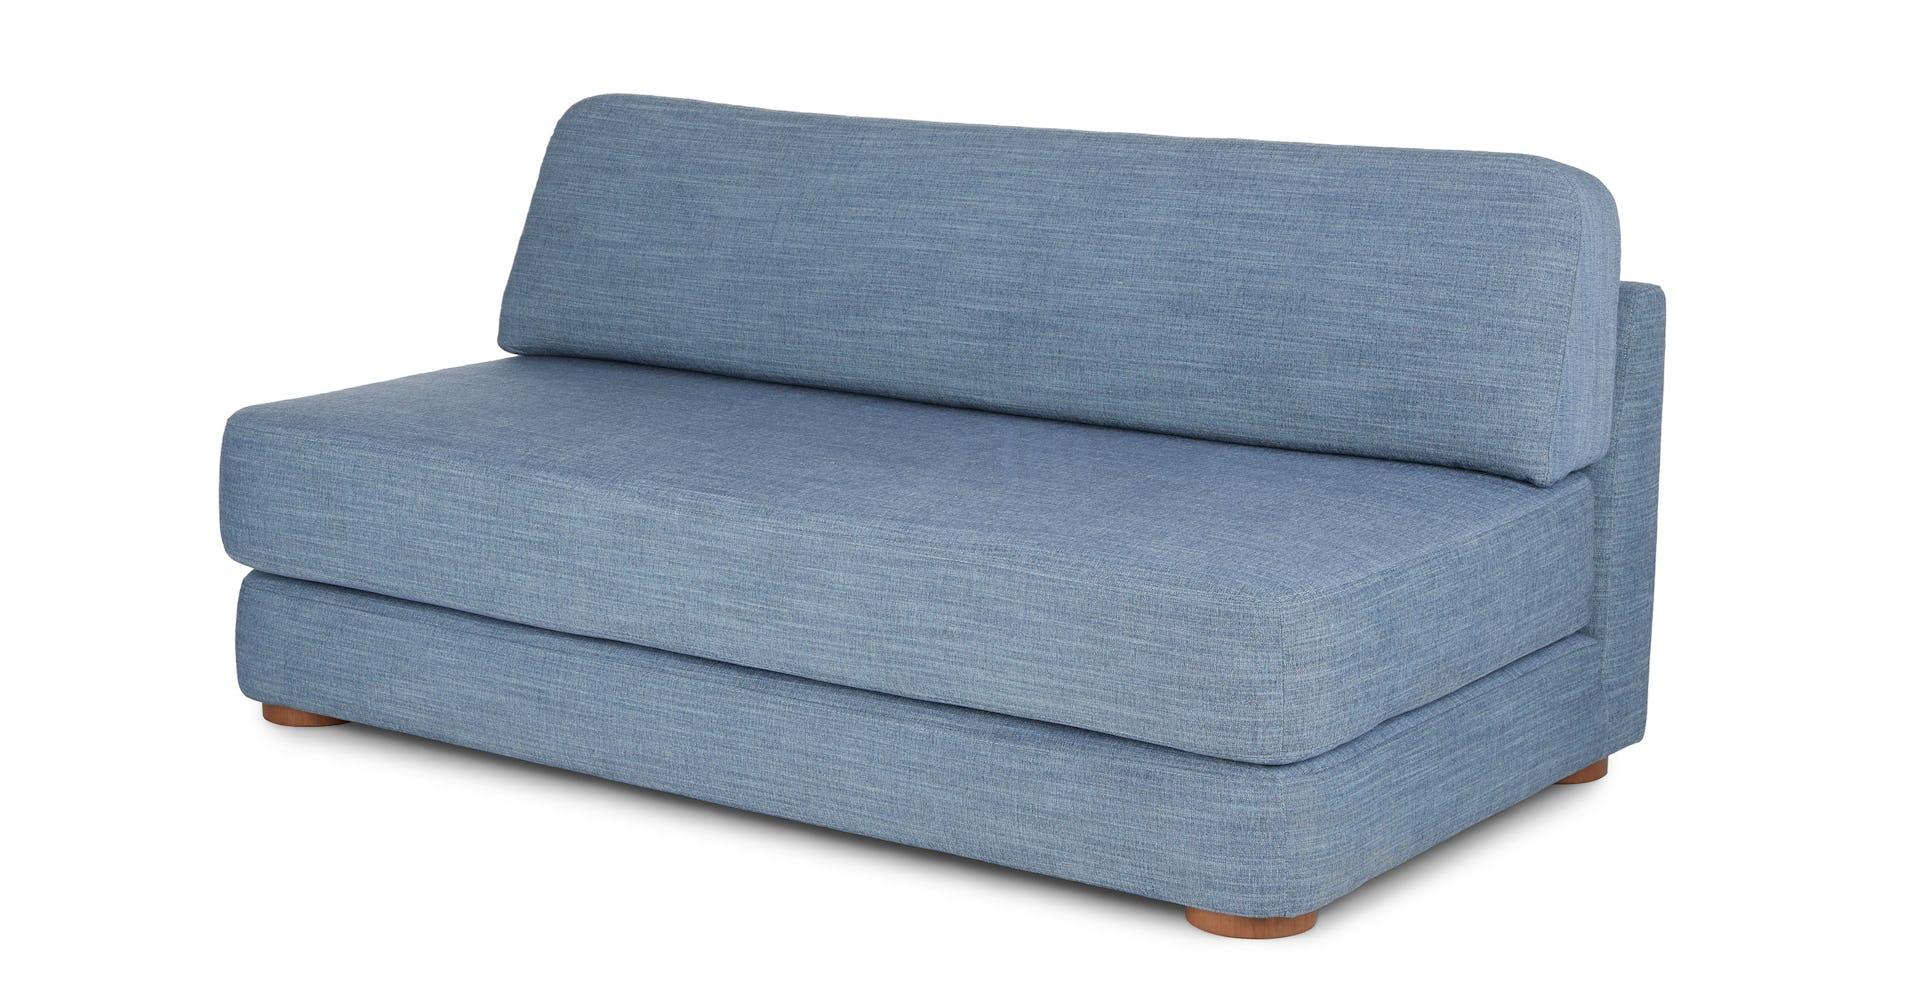 Fine Simplis Bay Blue Sofa Ncnpc Chair Design For Home Ncnpcorg